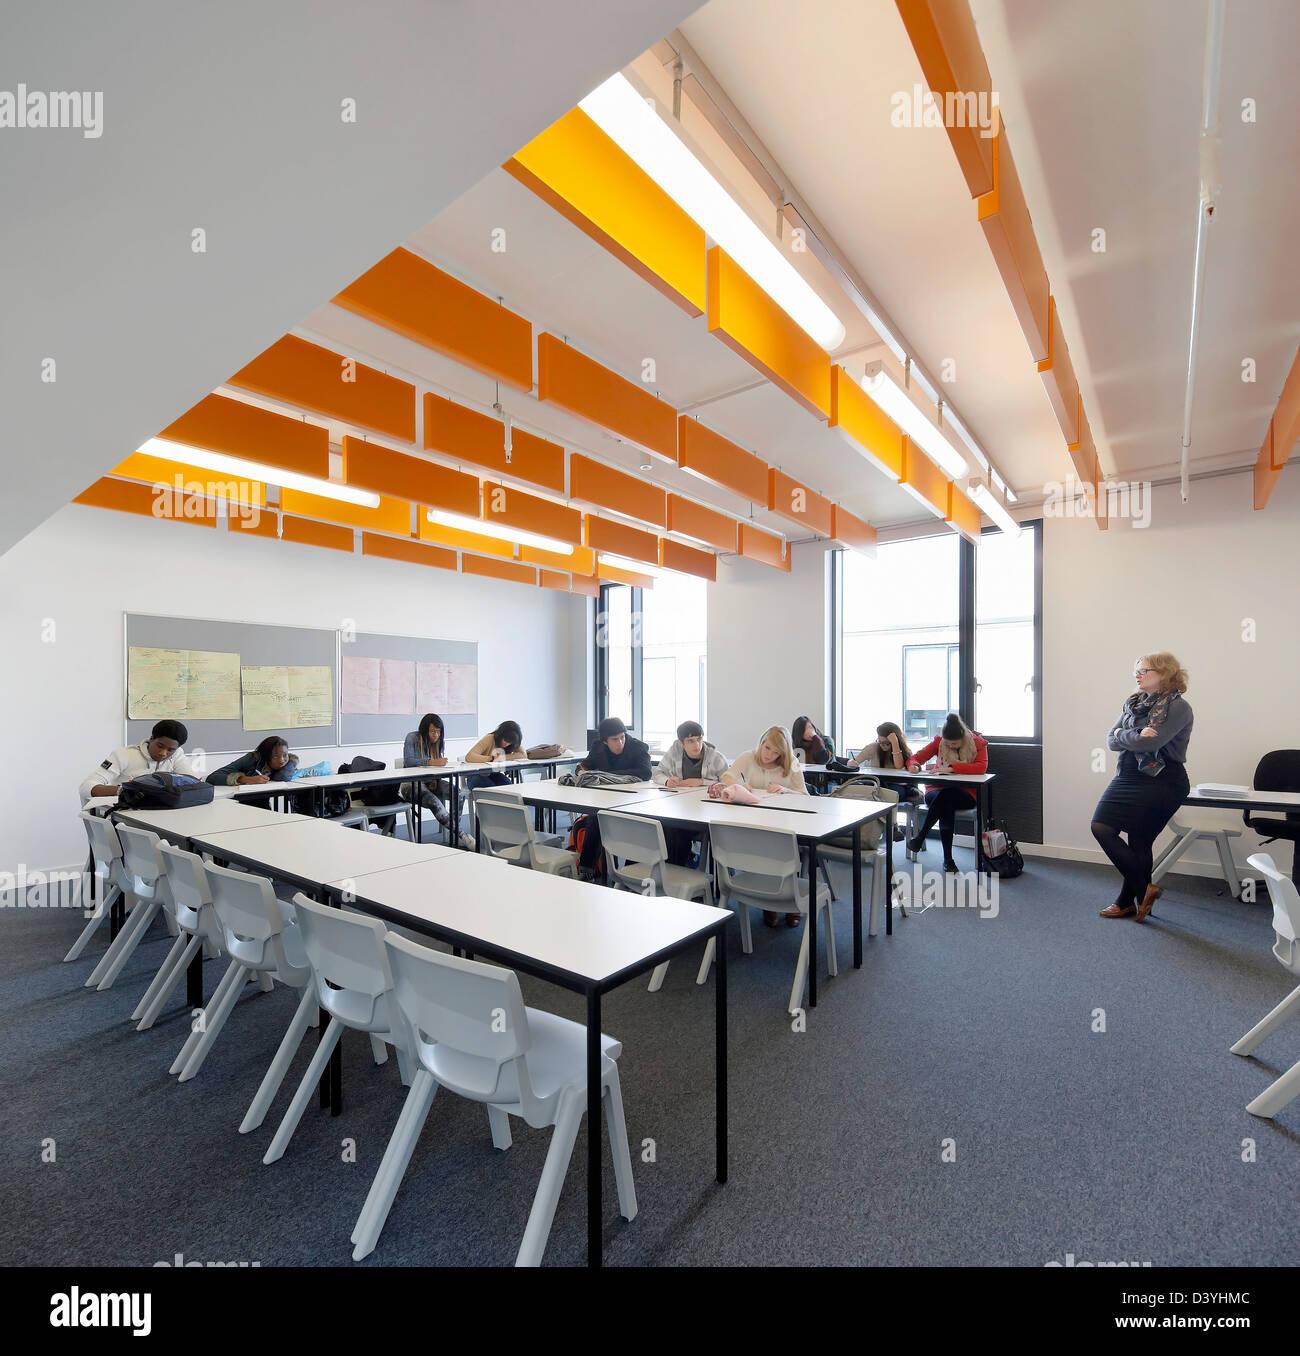 Thomas Tallis School, Greenwich, United Kingdom. Architect: John McAslan & Partners, 2012. Classroom. - Stock Image